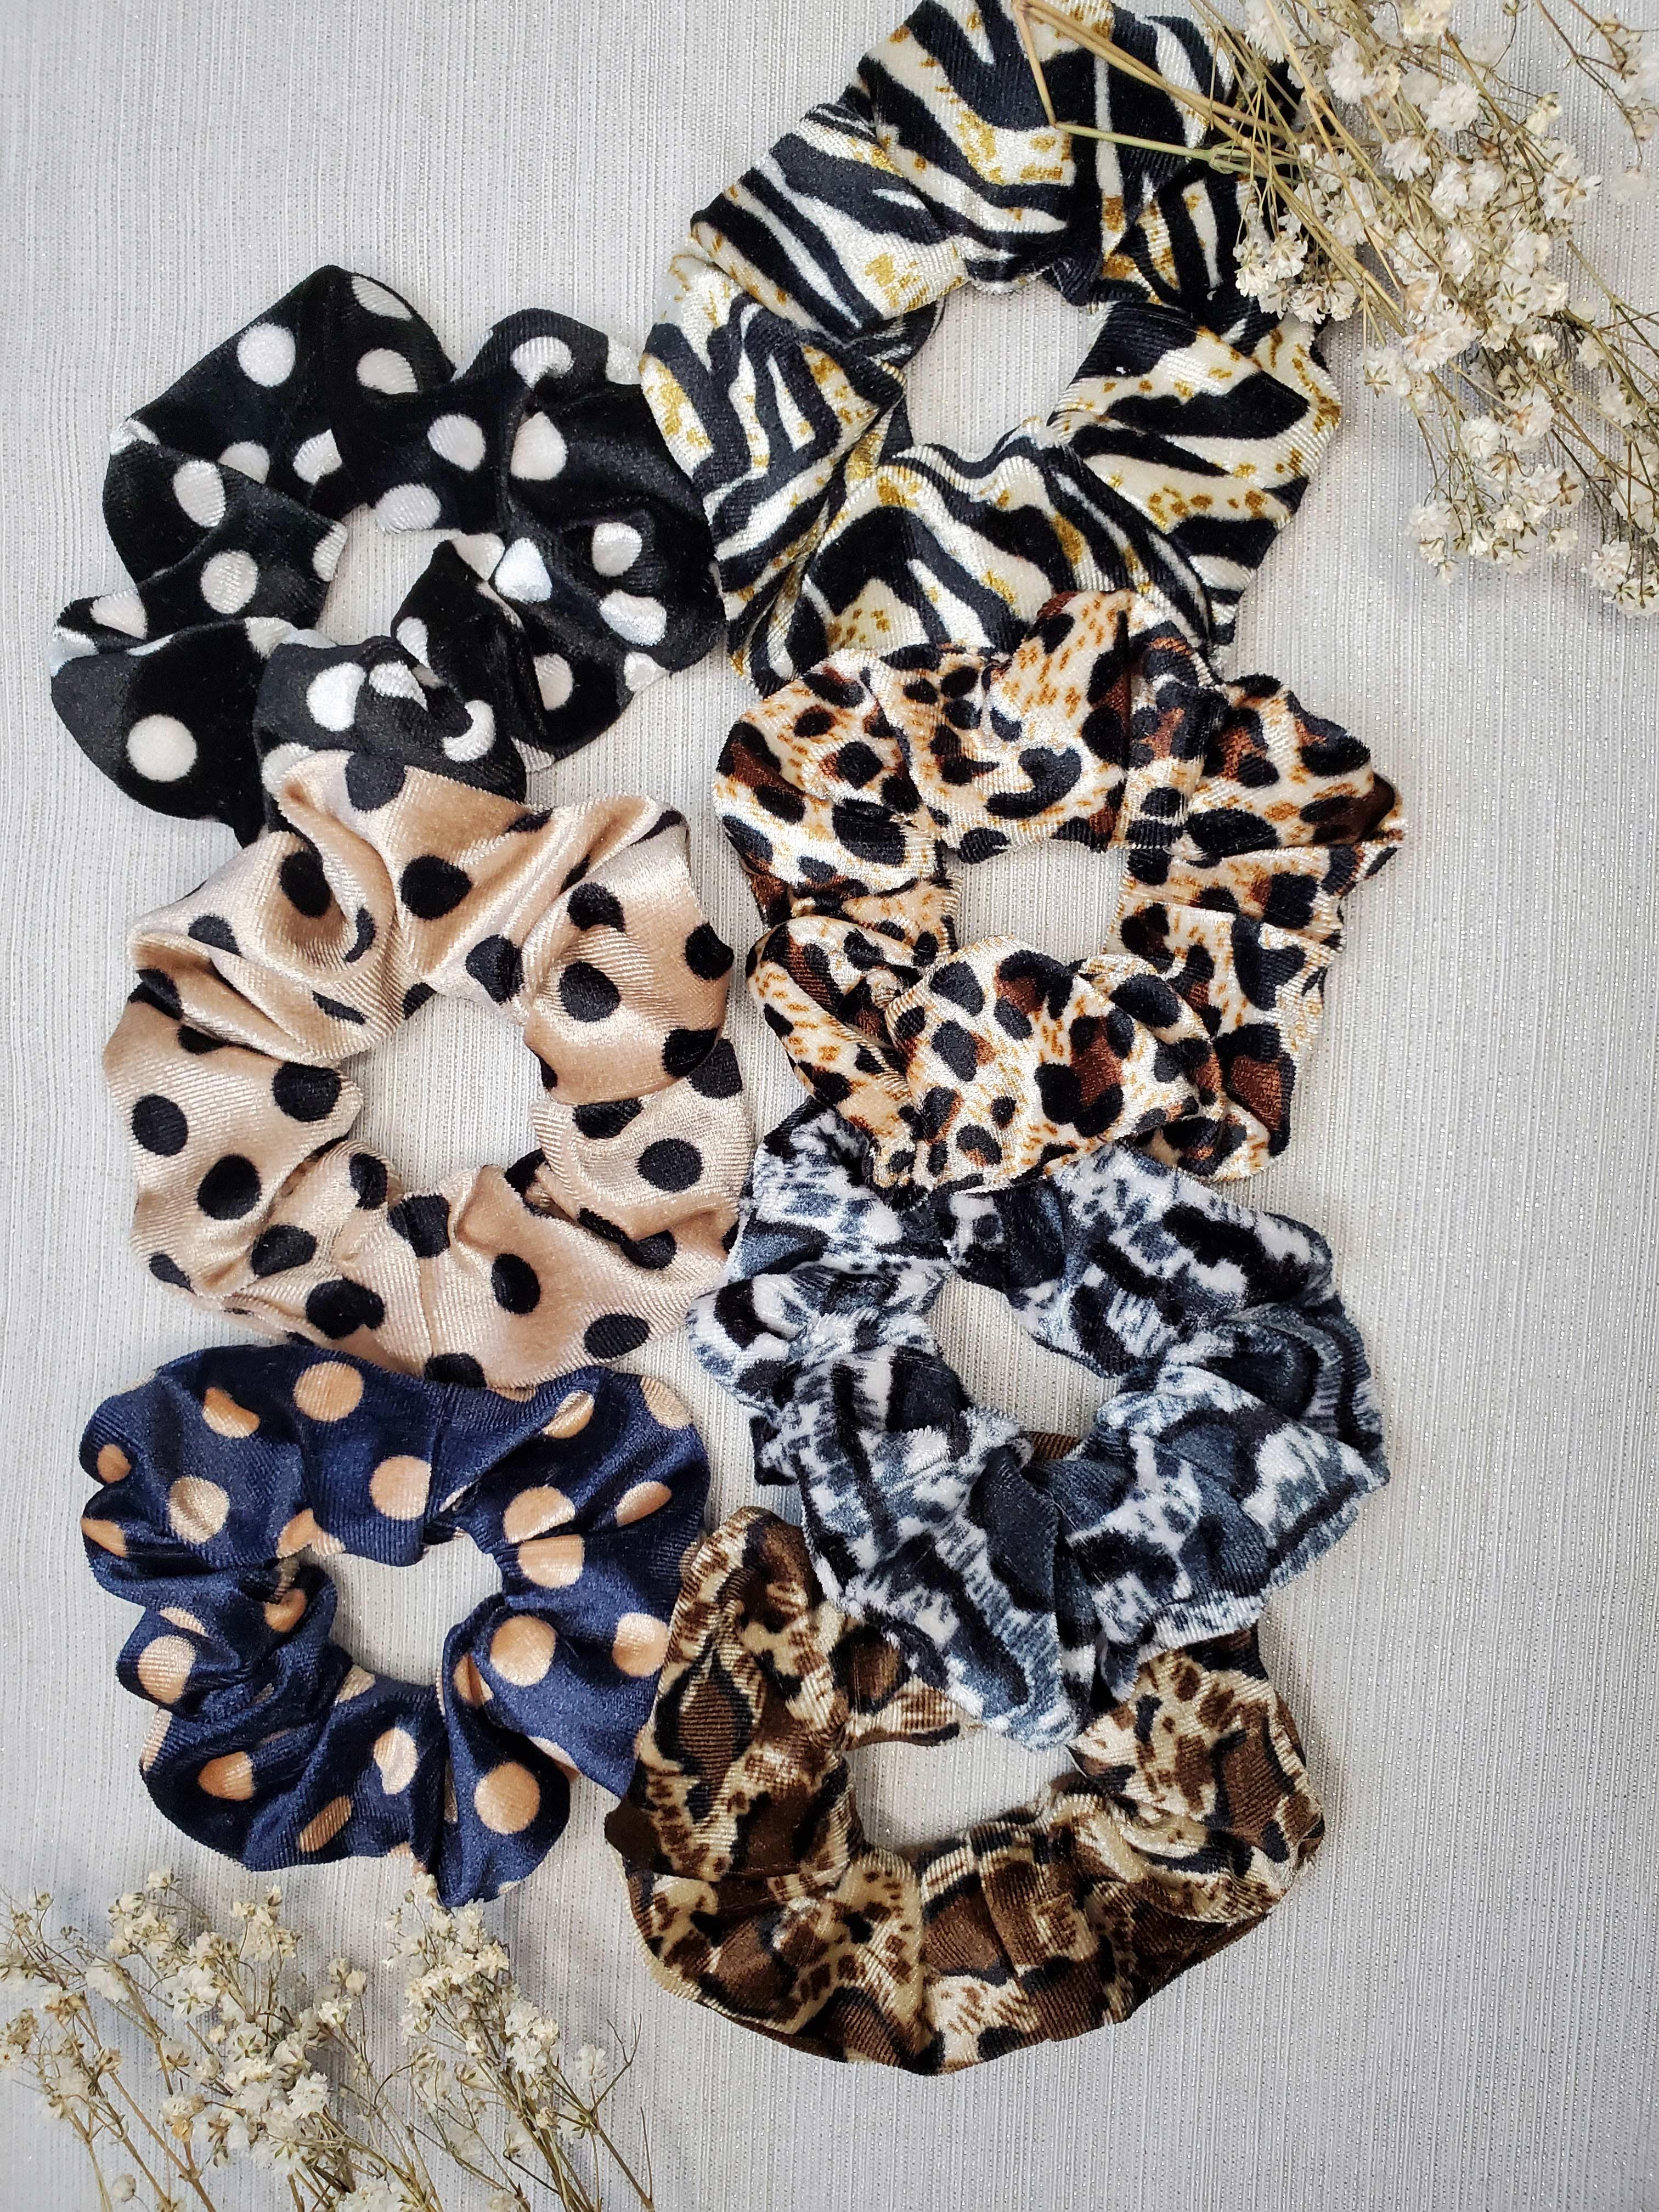 7 scrunchies (3 polka dot and 4 animal print)